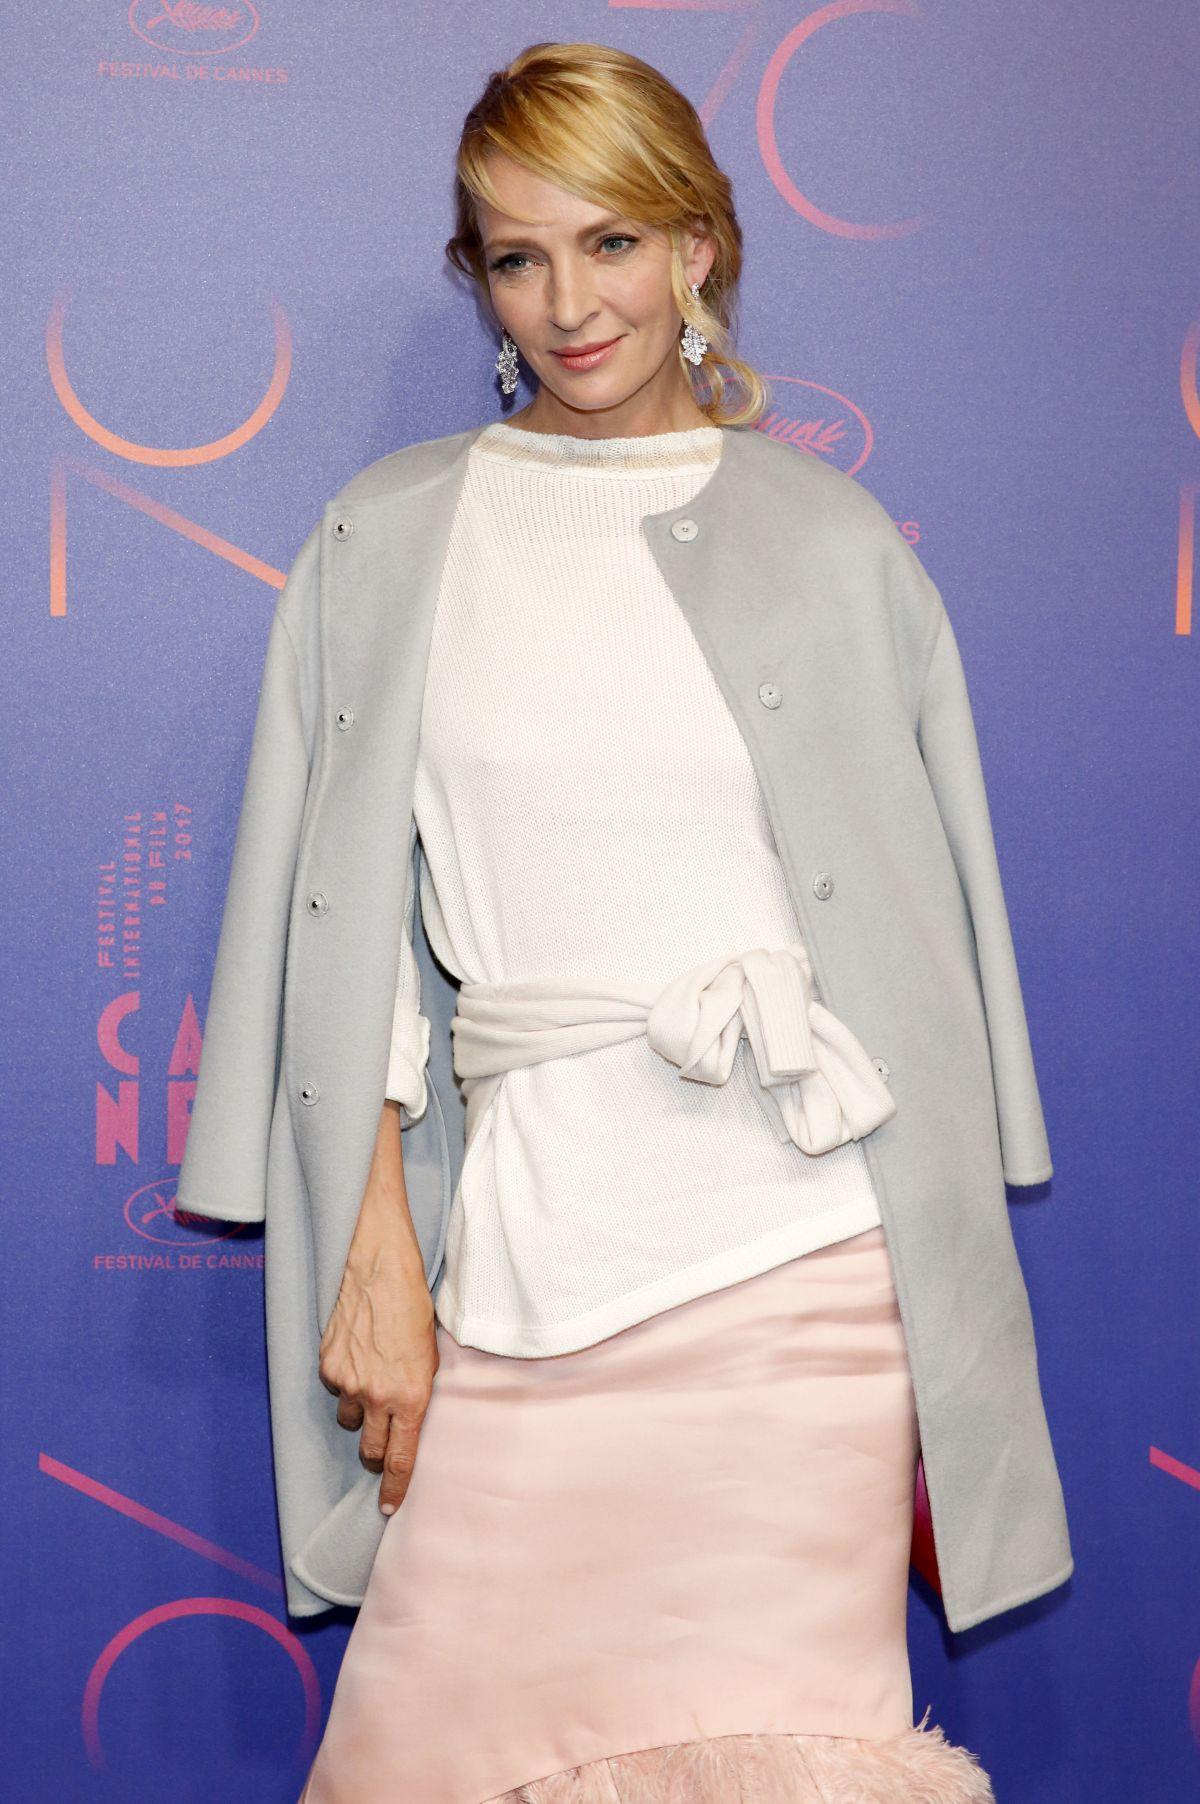 UMA THURMAN at Cannes Film Festival 70th Anniversary Dinner 05/23/2017